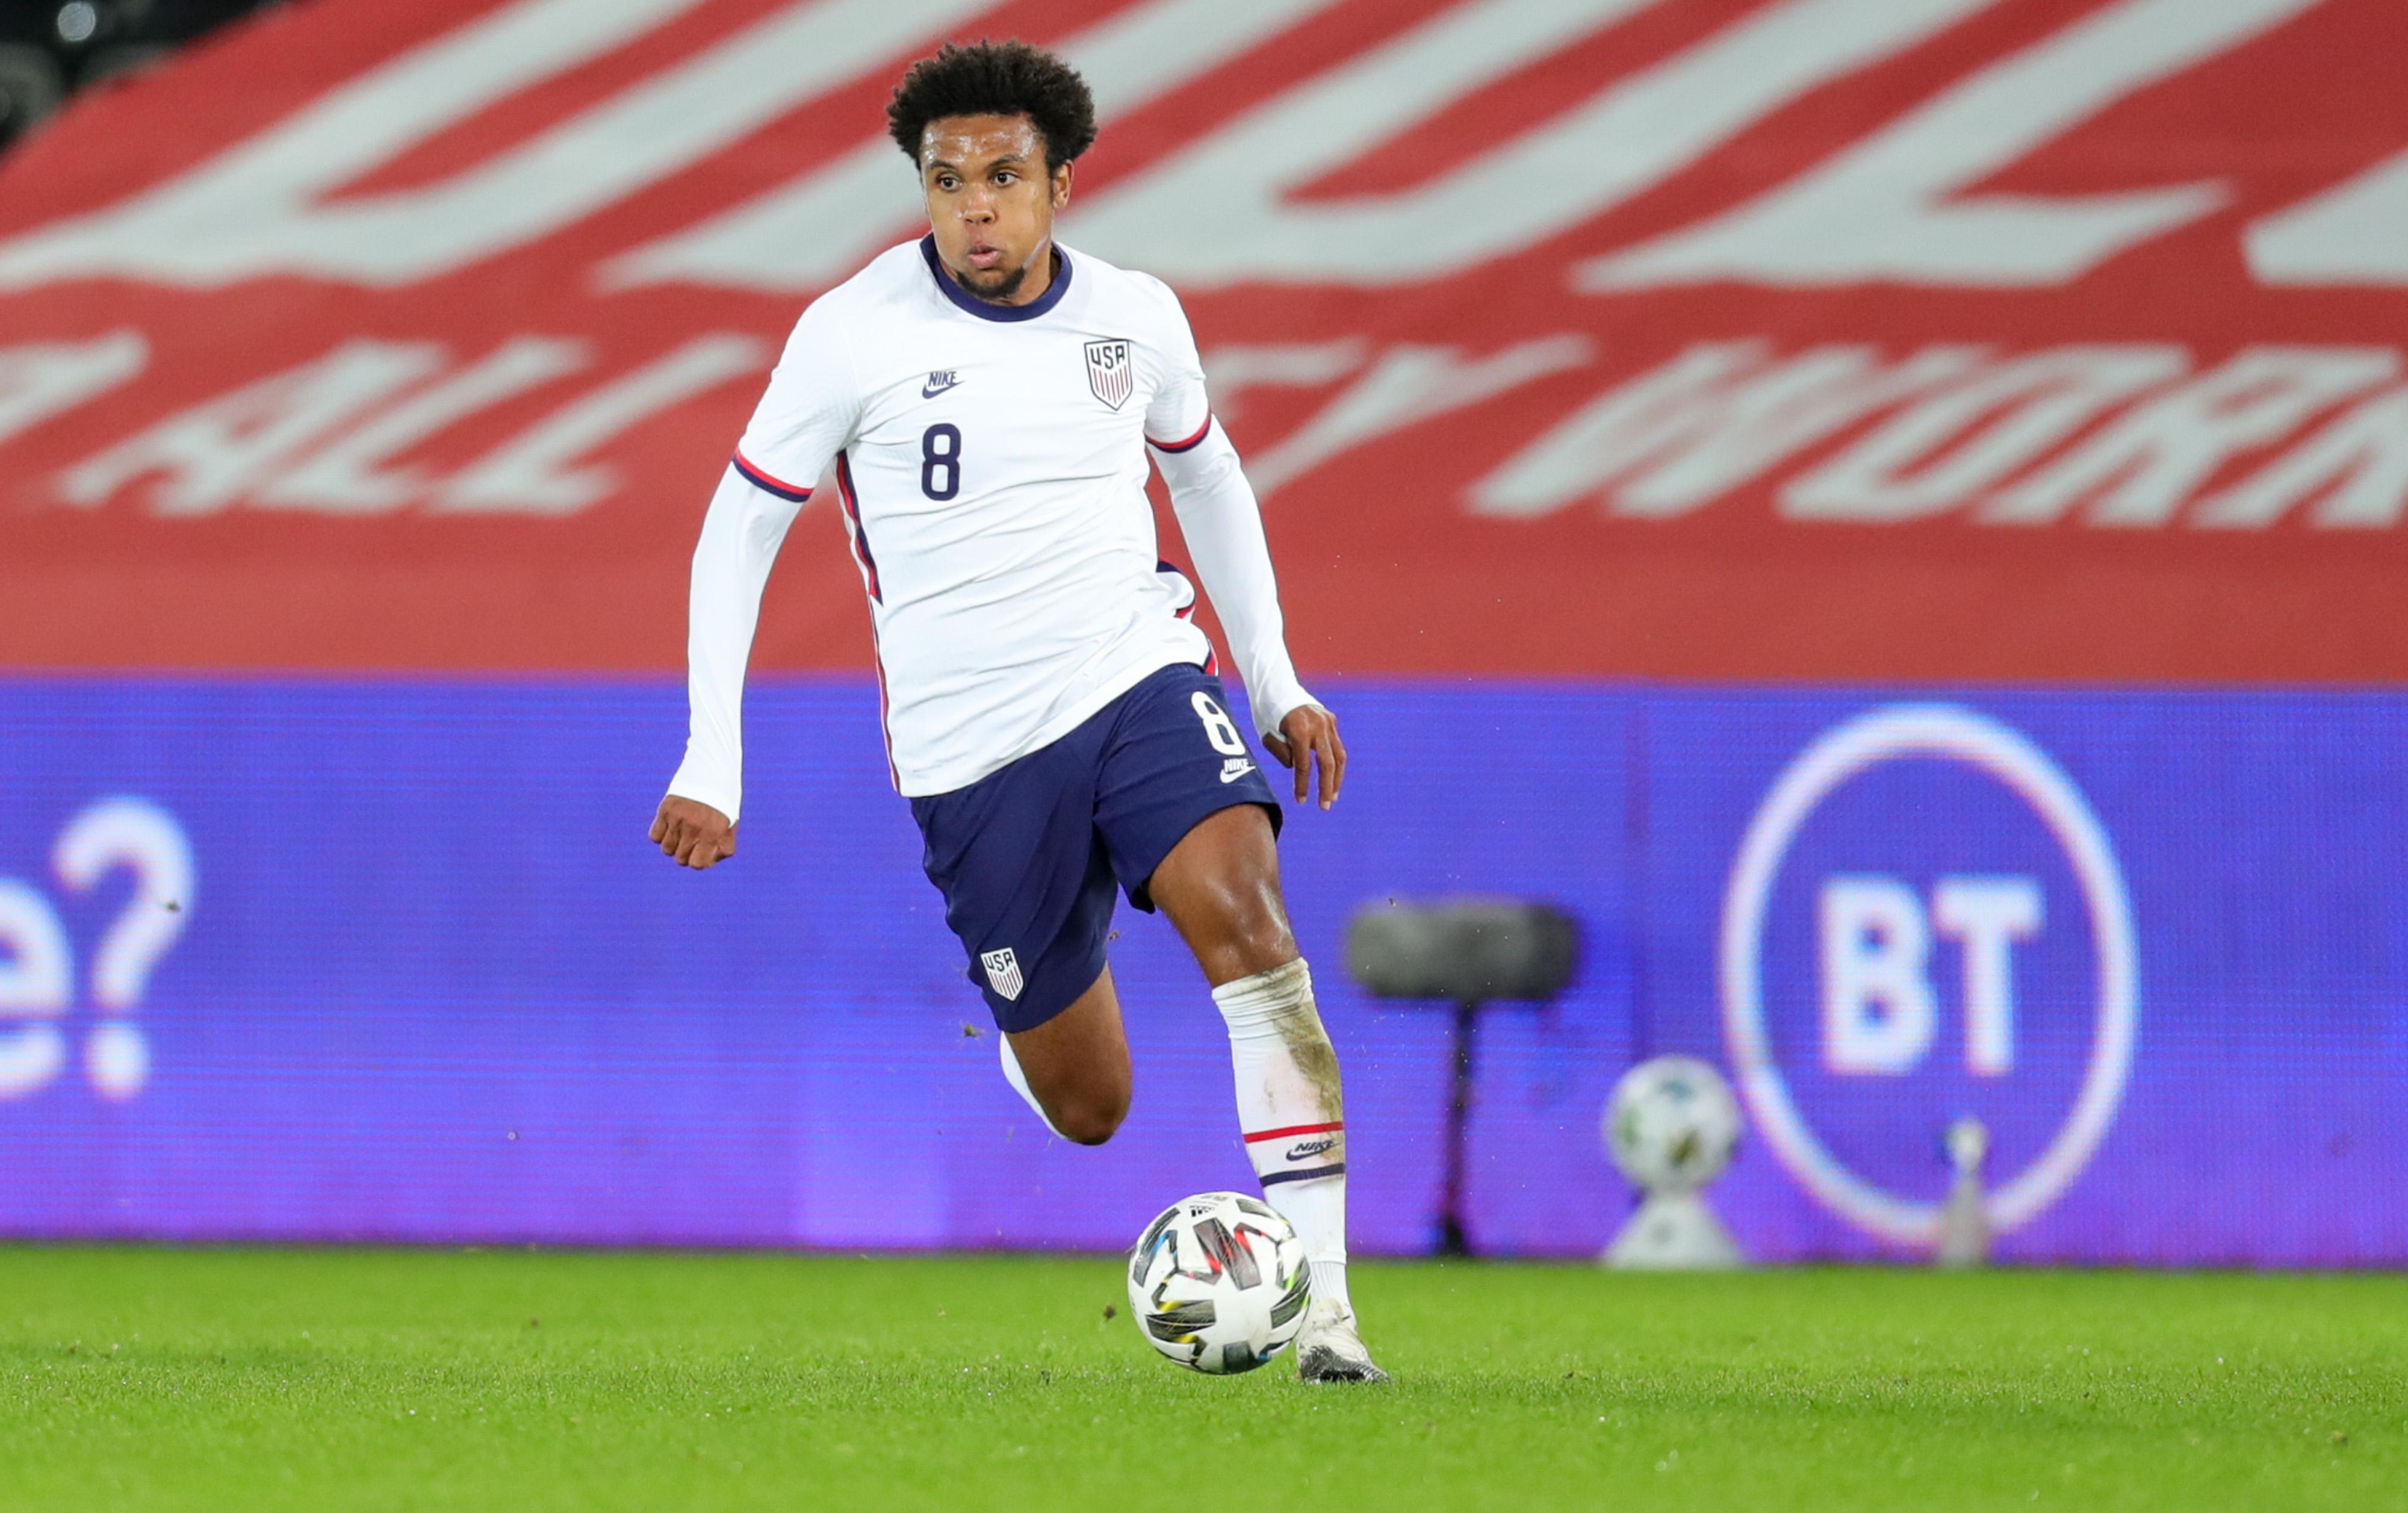 Wales v USA - International Friendly